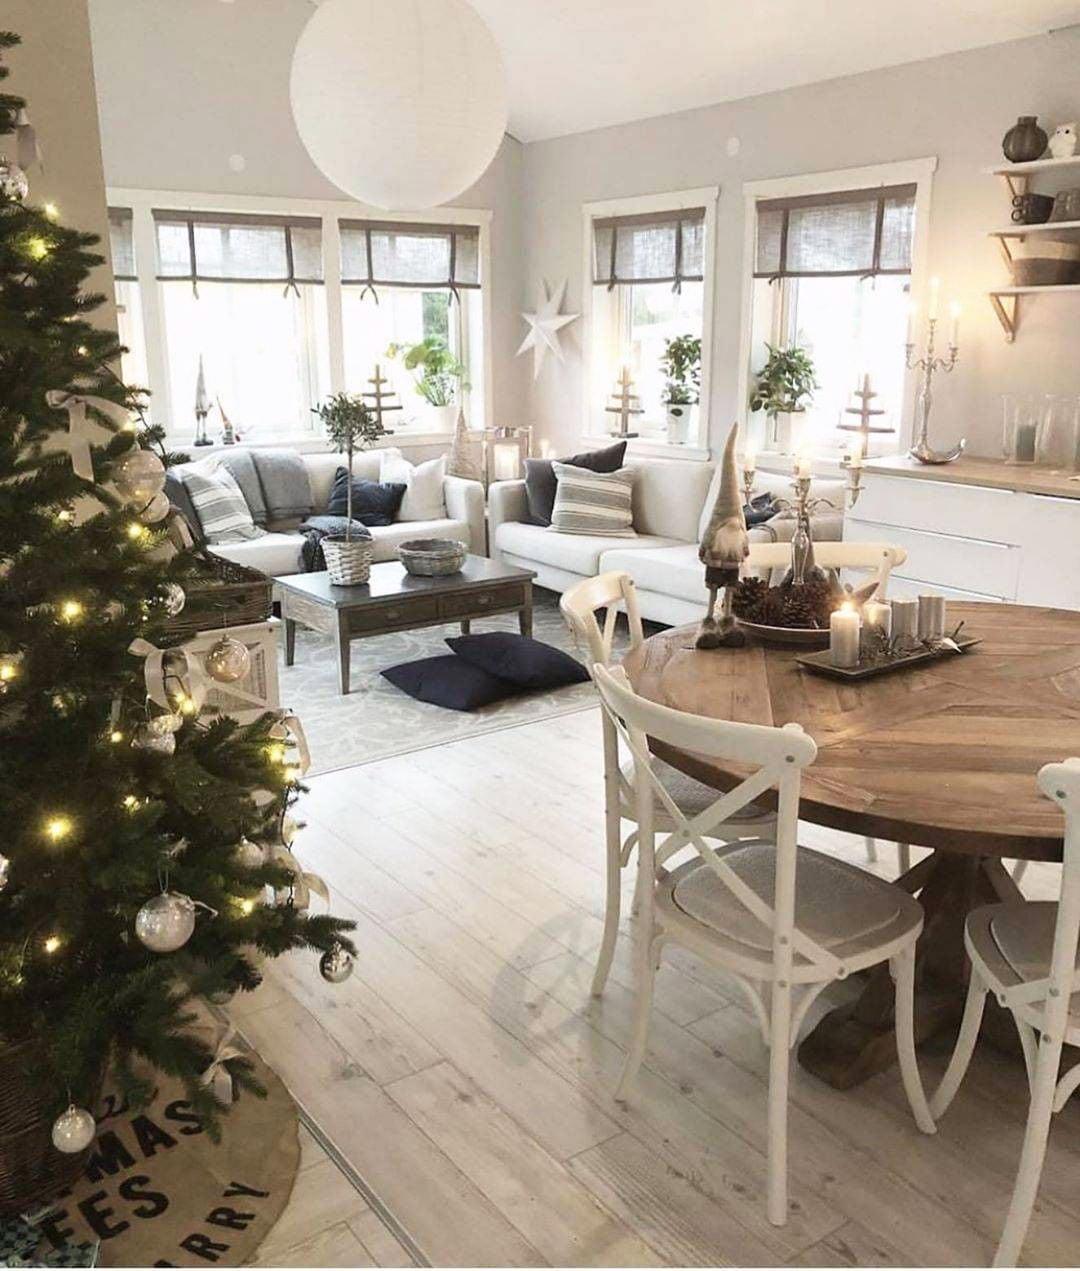 49 Simple Christmas Tree Decorating Ideas 3